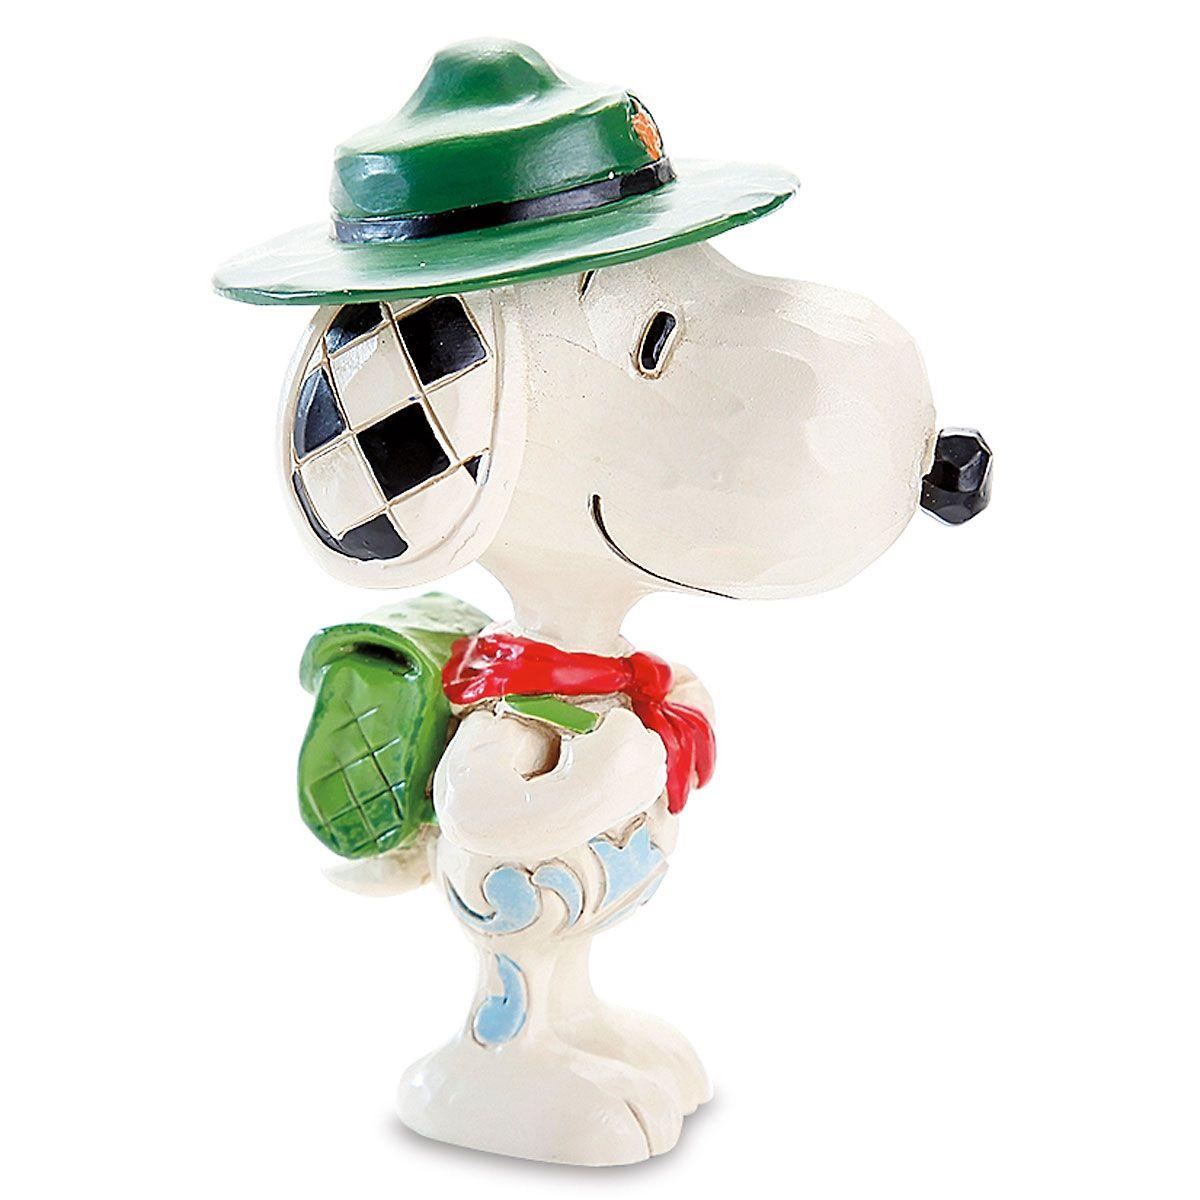 Snoopy Boy Scout Mini Figurine by Jim Shore